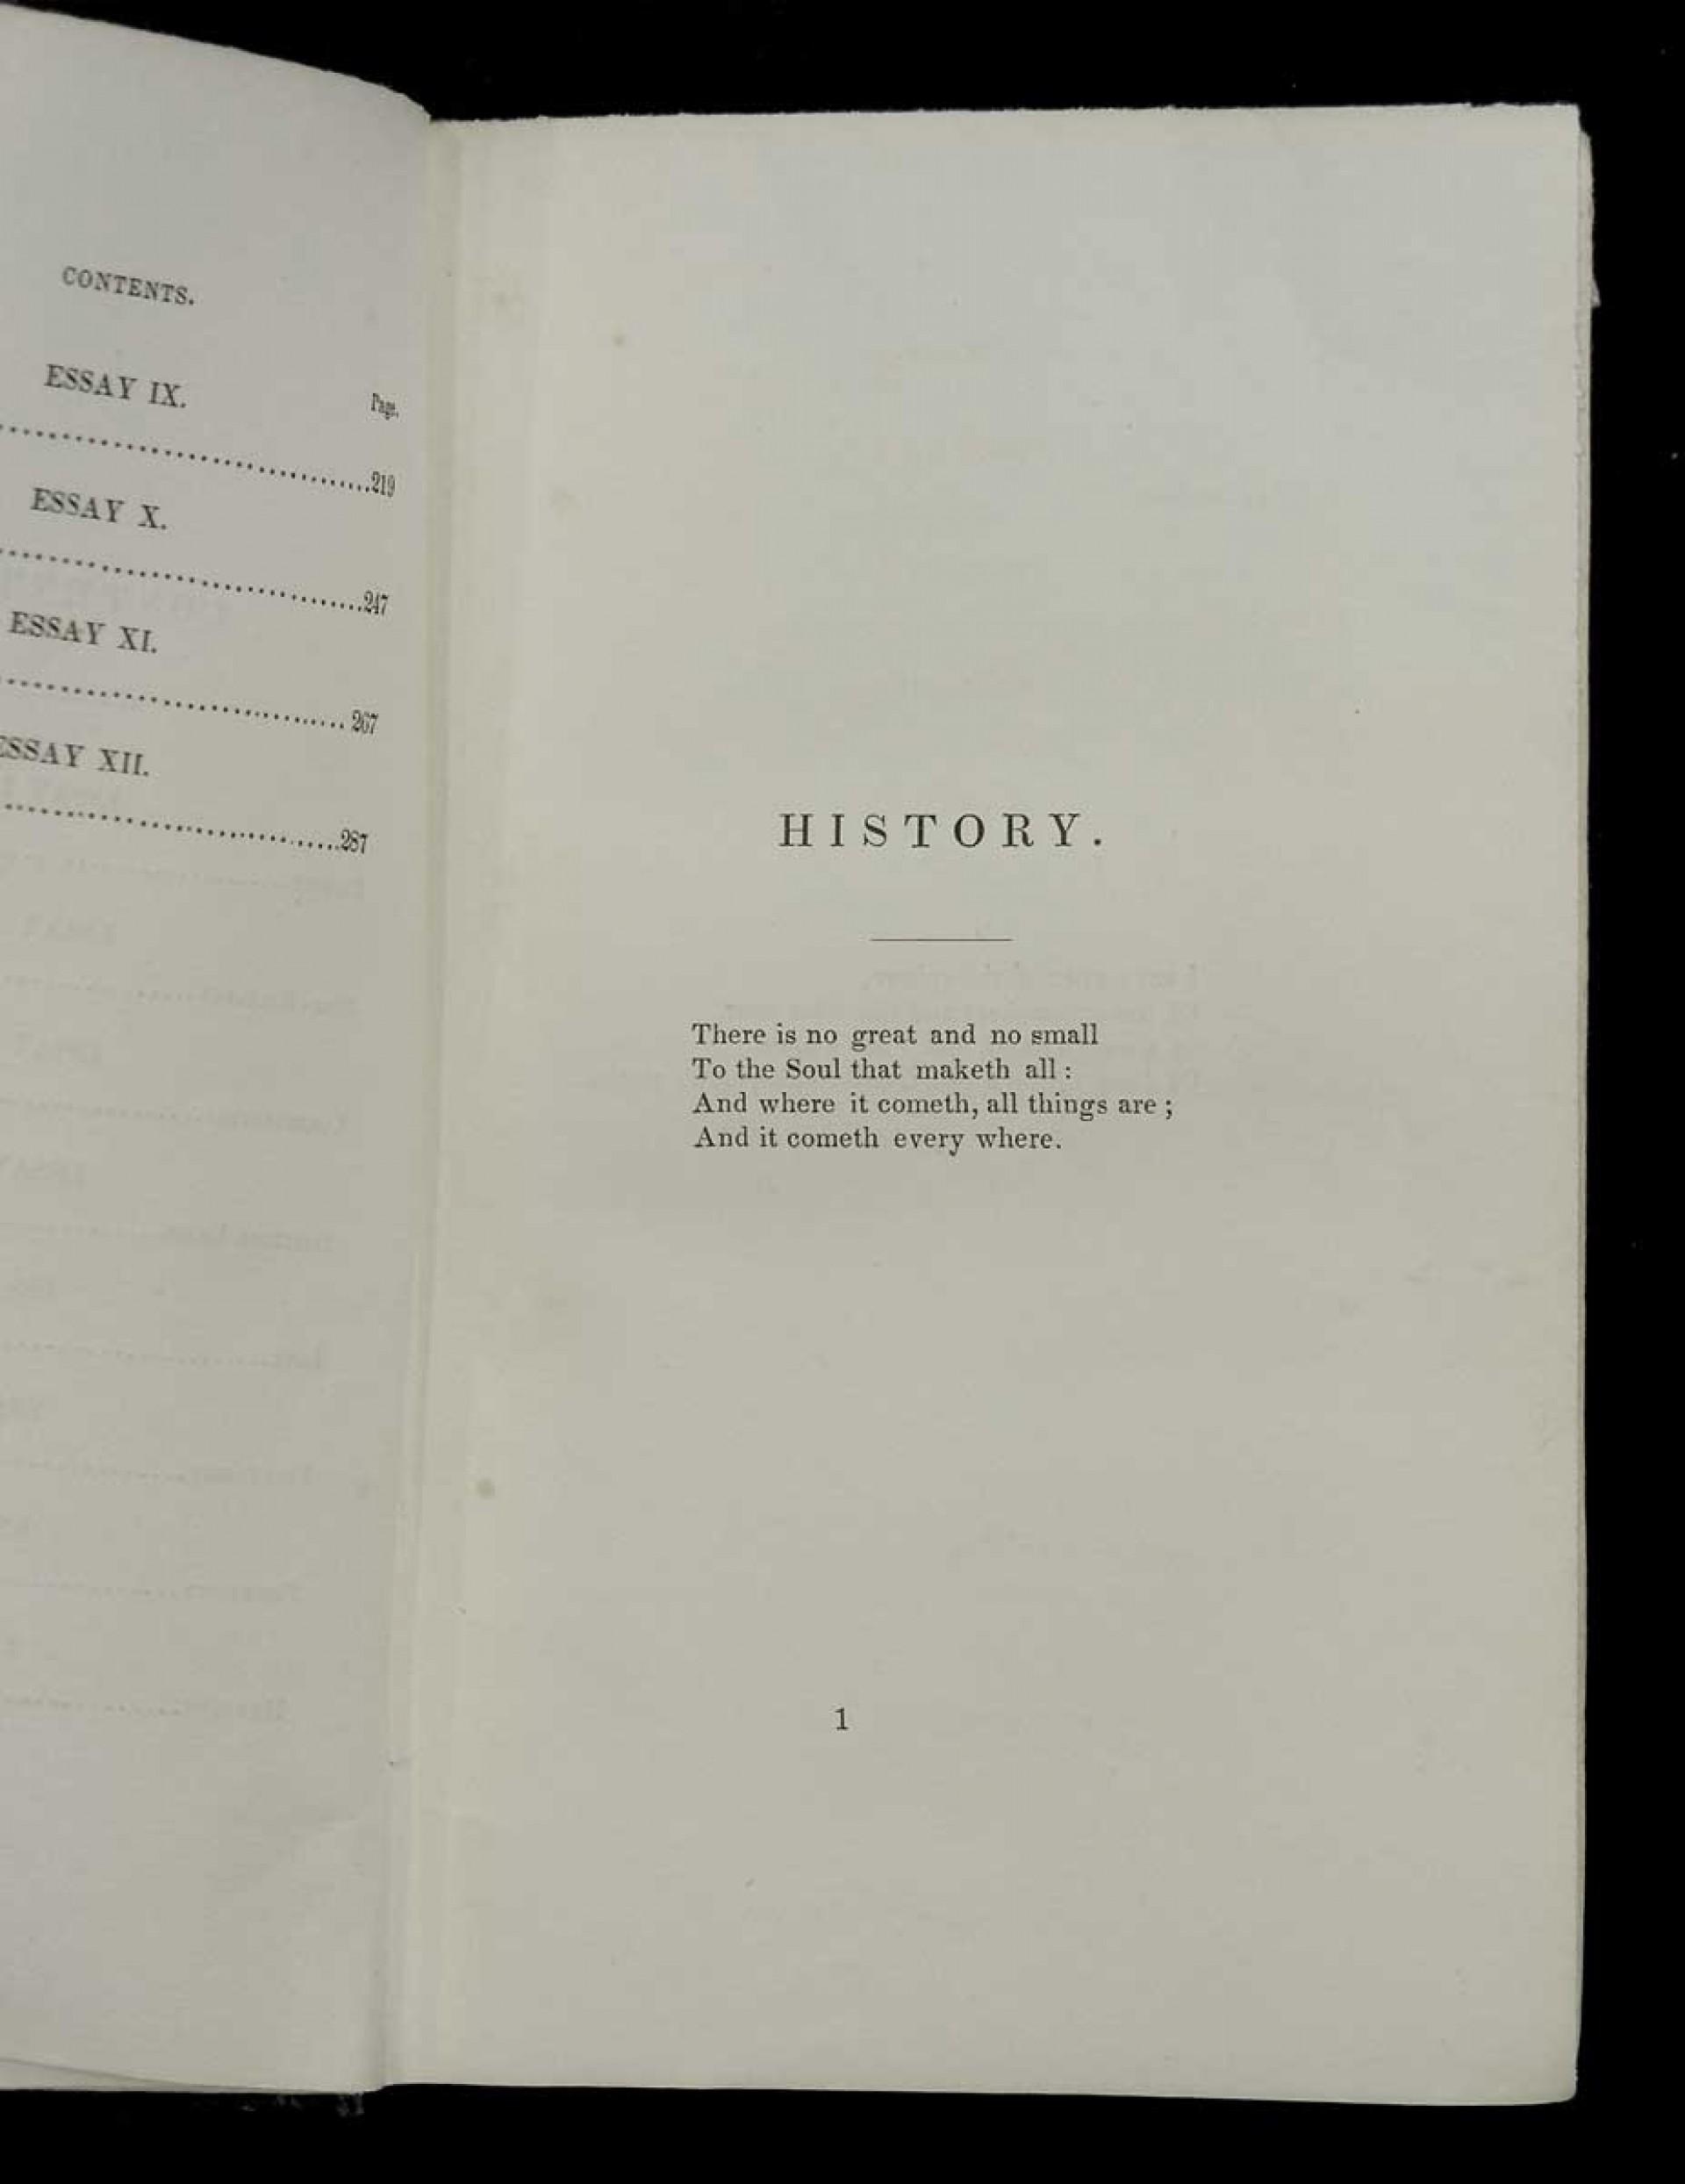 018 Essay Example 4818emerson Wl Emerson Dreaded Essays Ralph Pdf First Series Summary Waldo Nature 1920